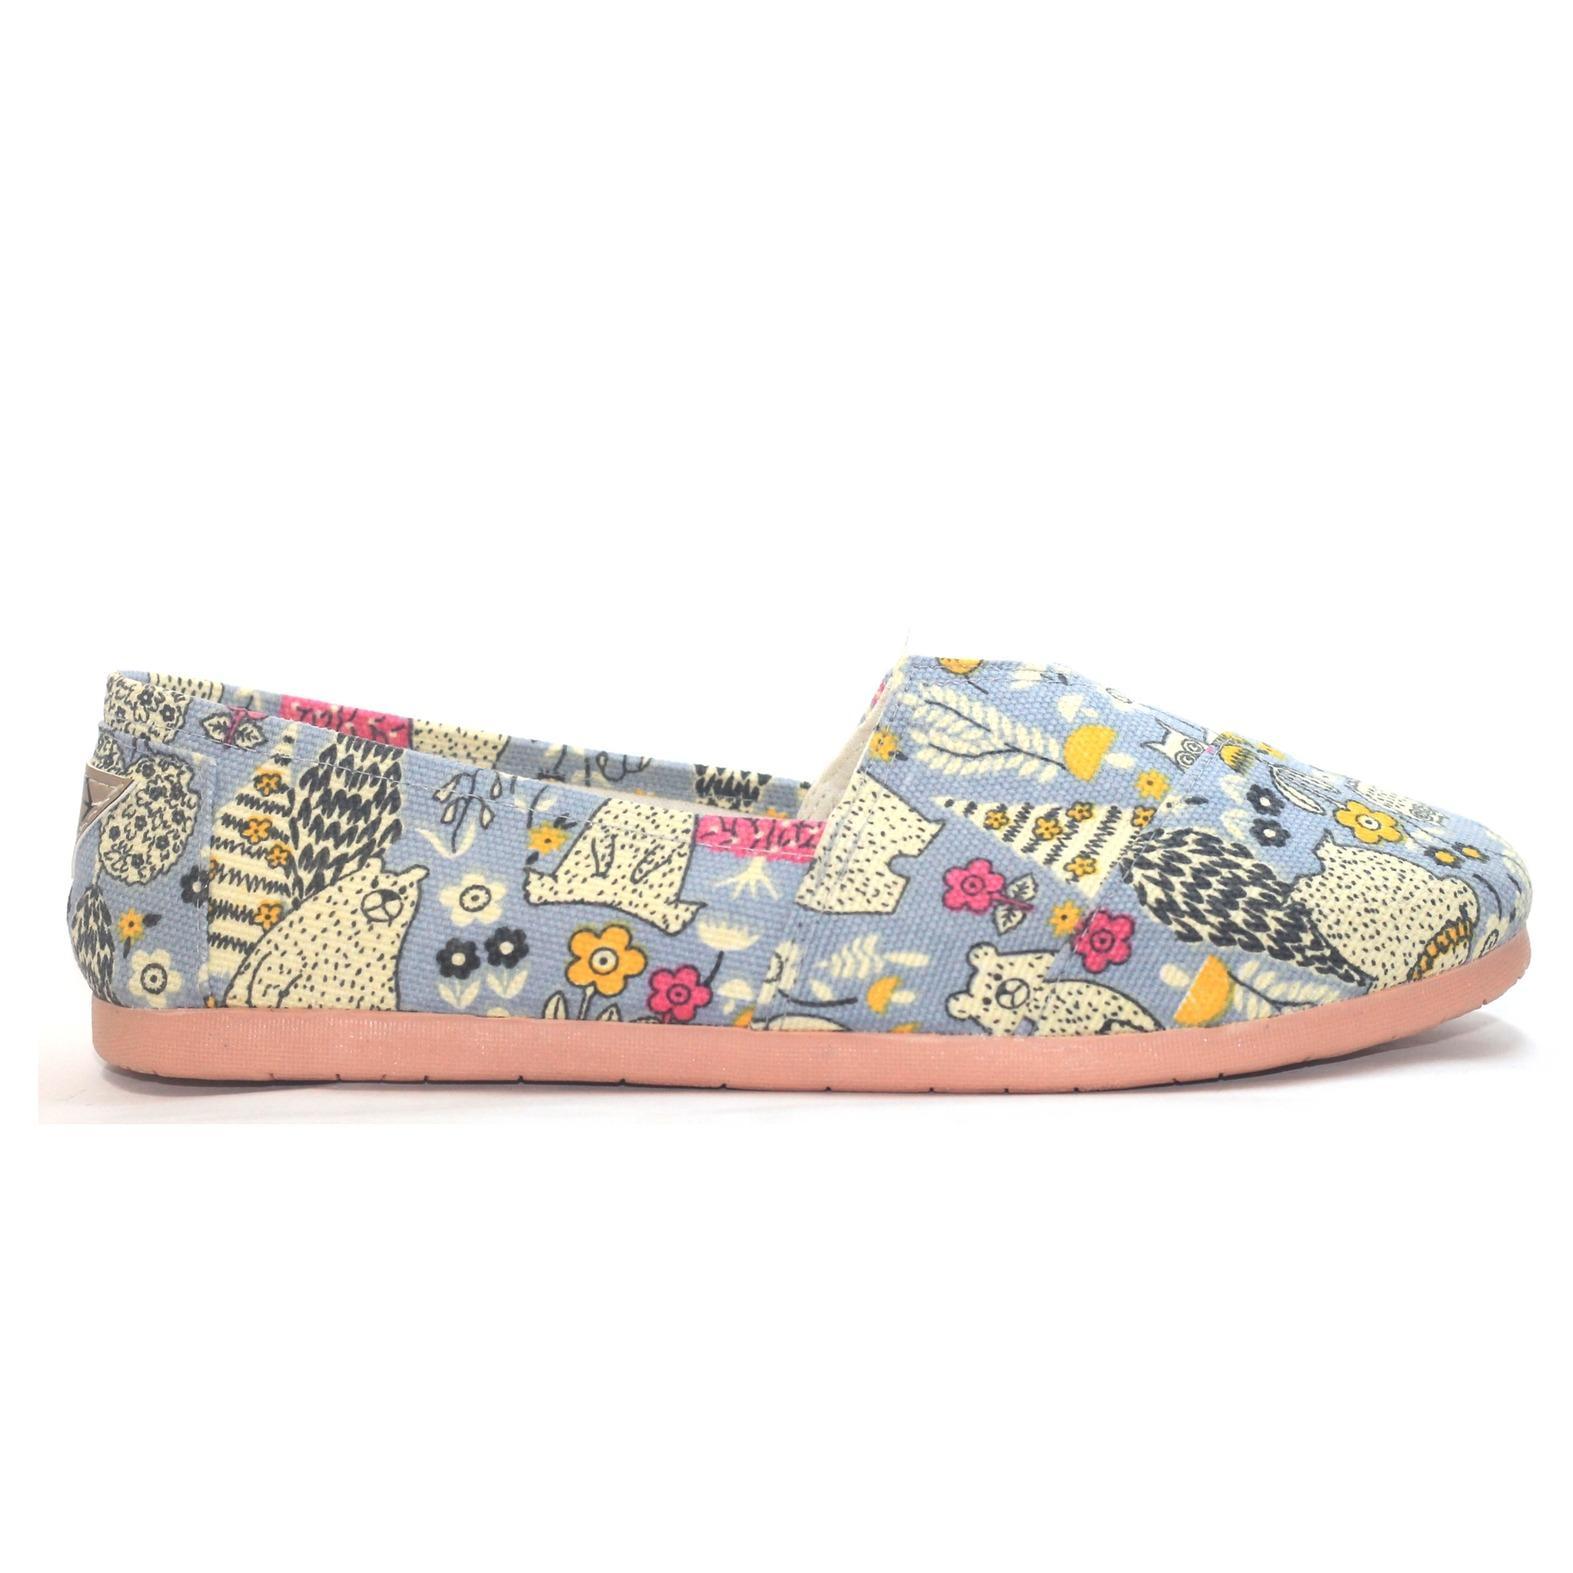 JRC sepatu wanita flatshoes slipon motif cartoon bear model toms / wakai